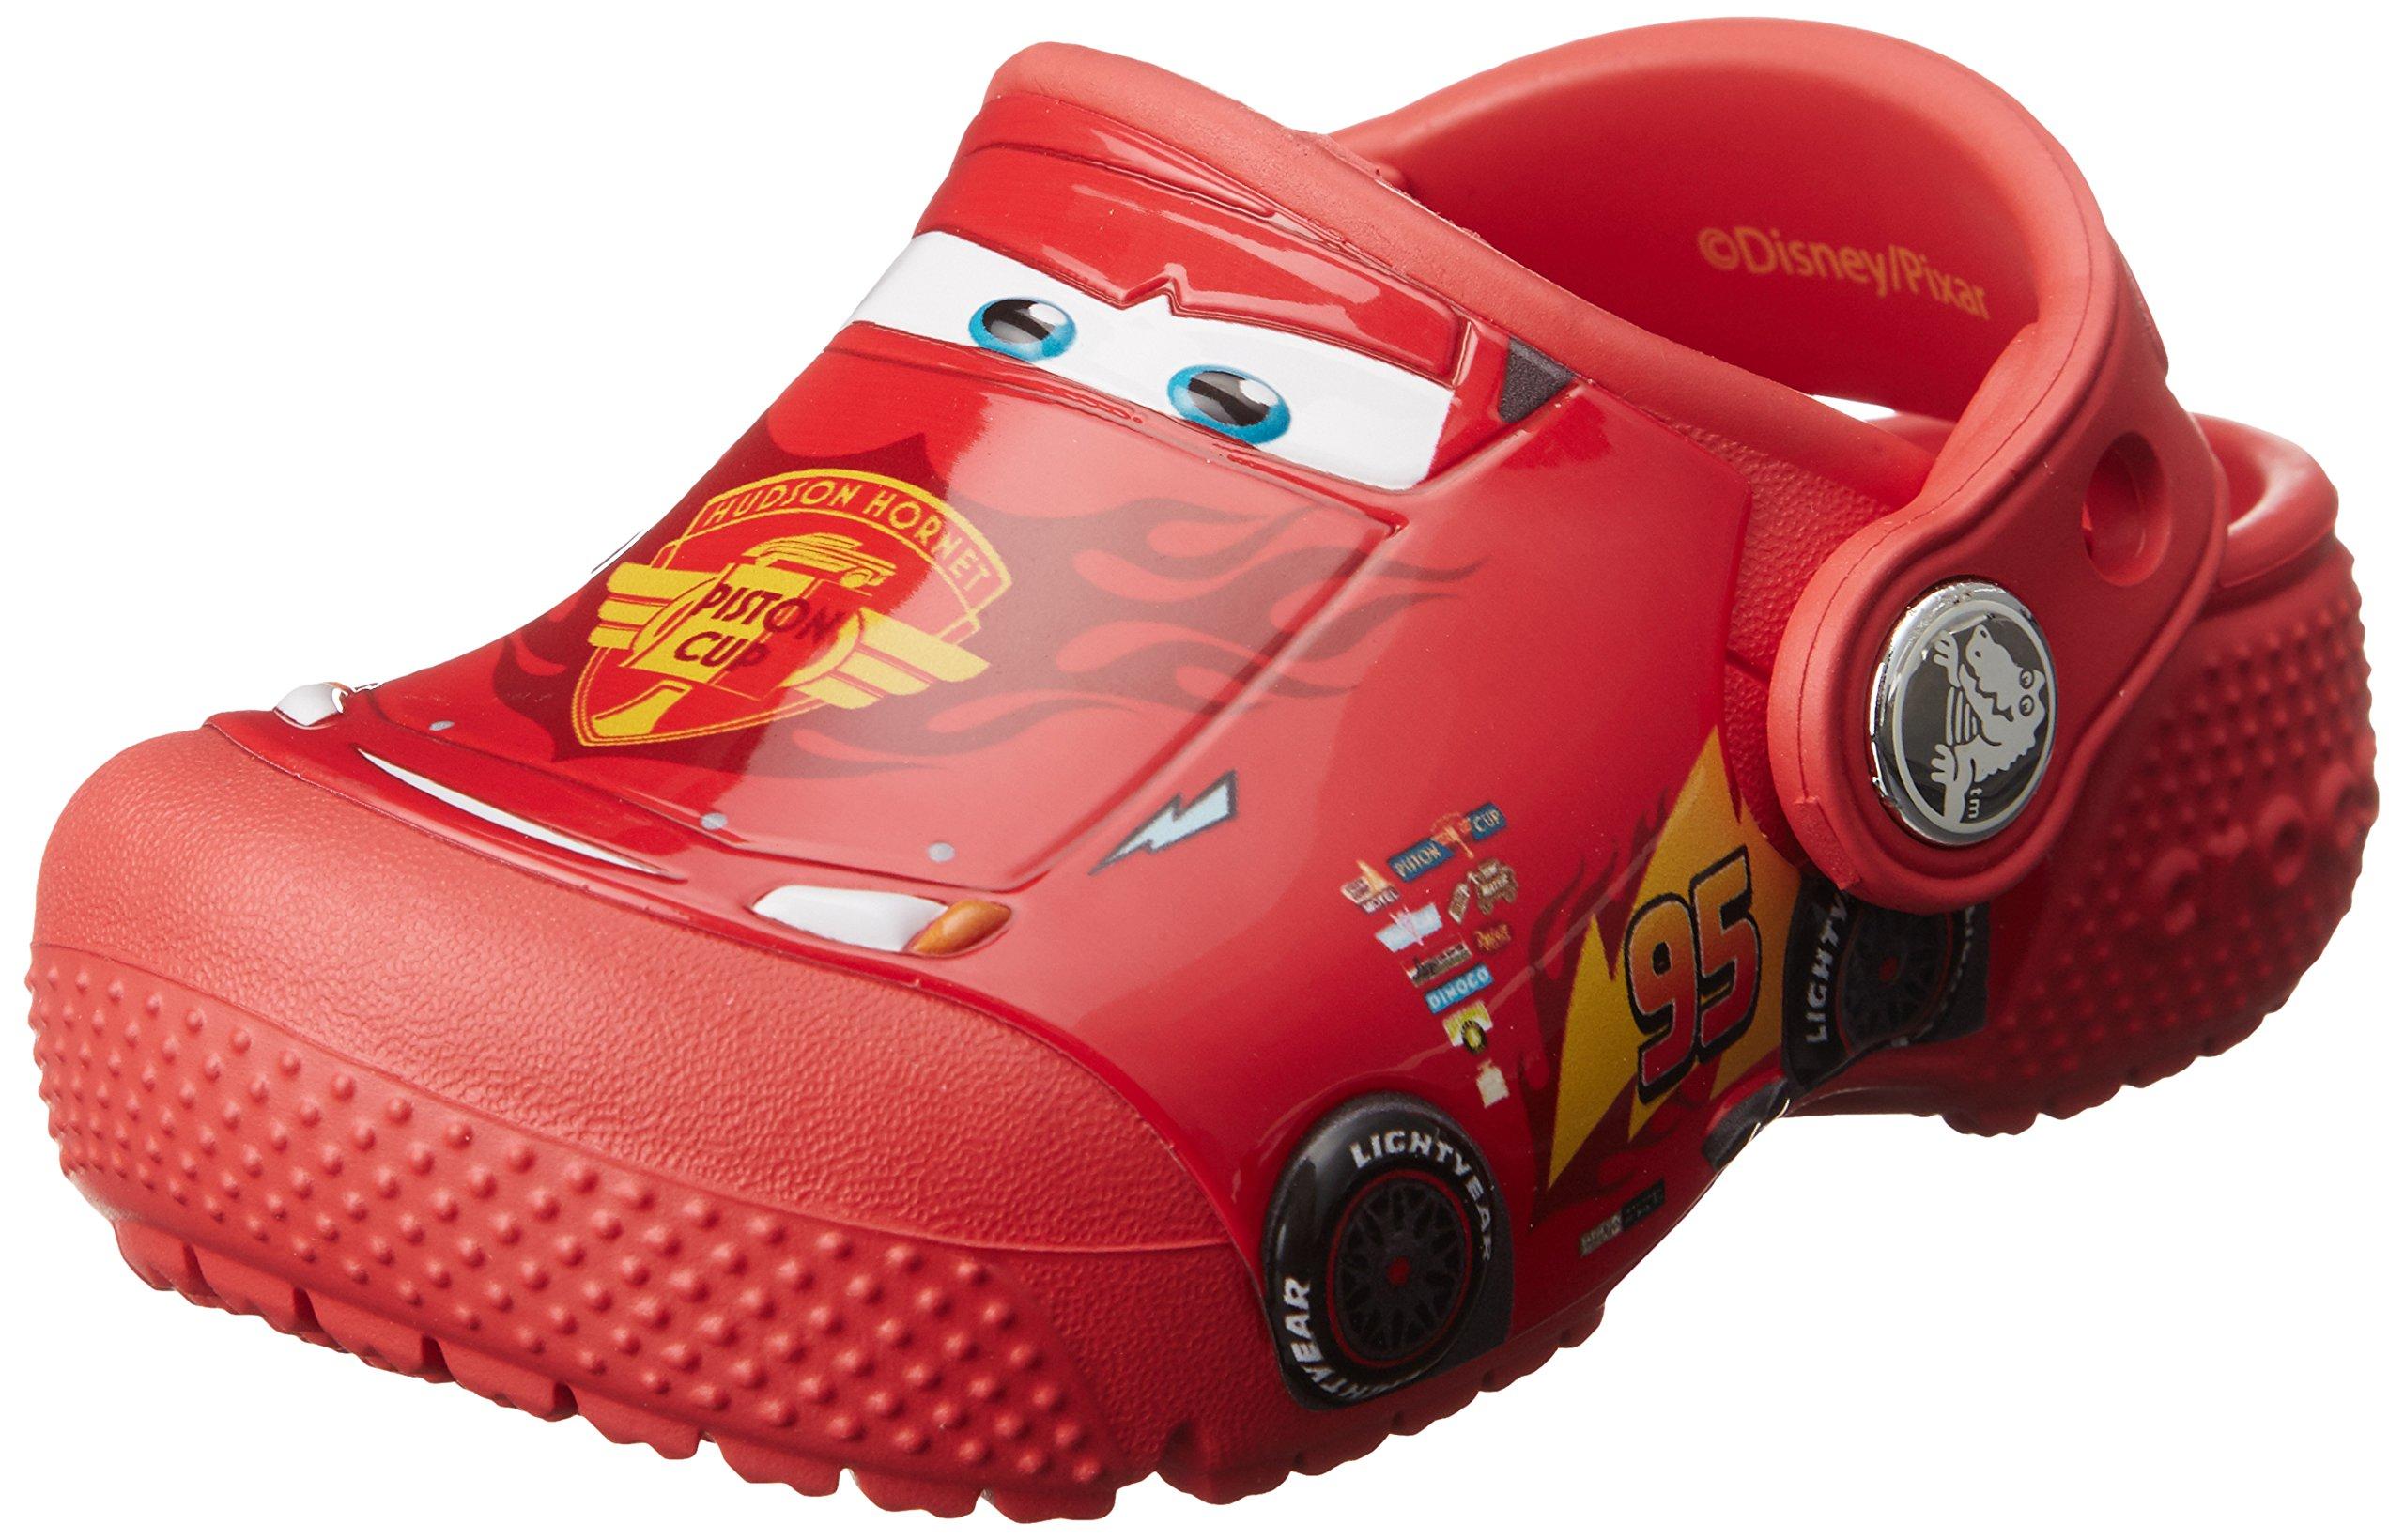 Crocs Kids' funlab Cars K Clog, Flame, 10 M US Toddler